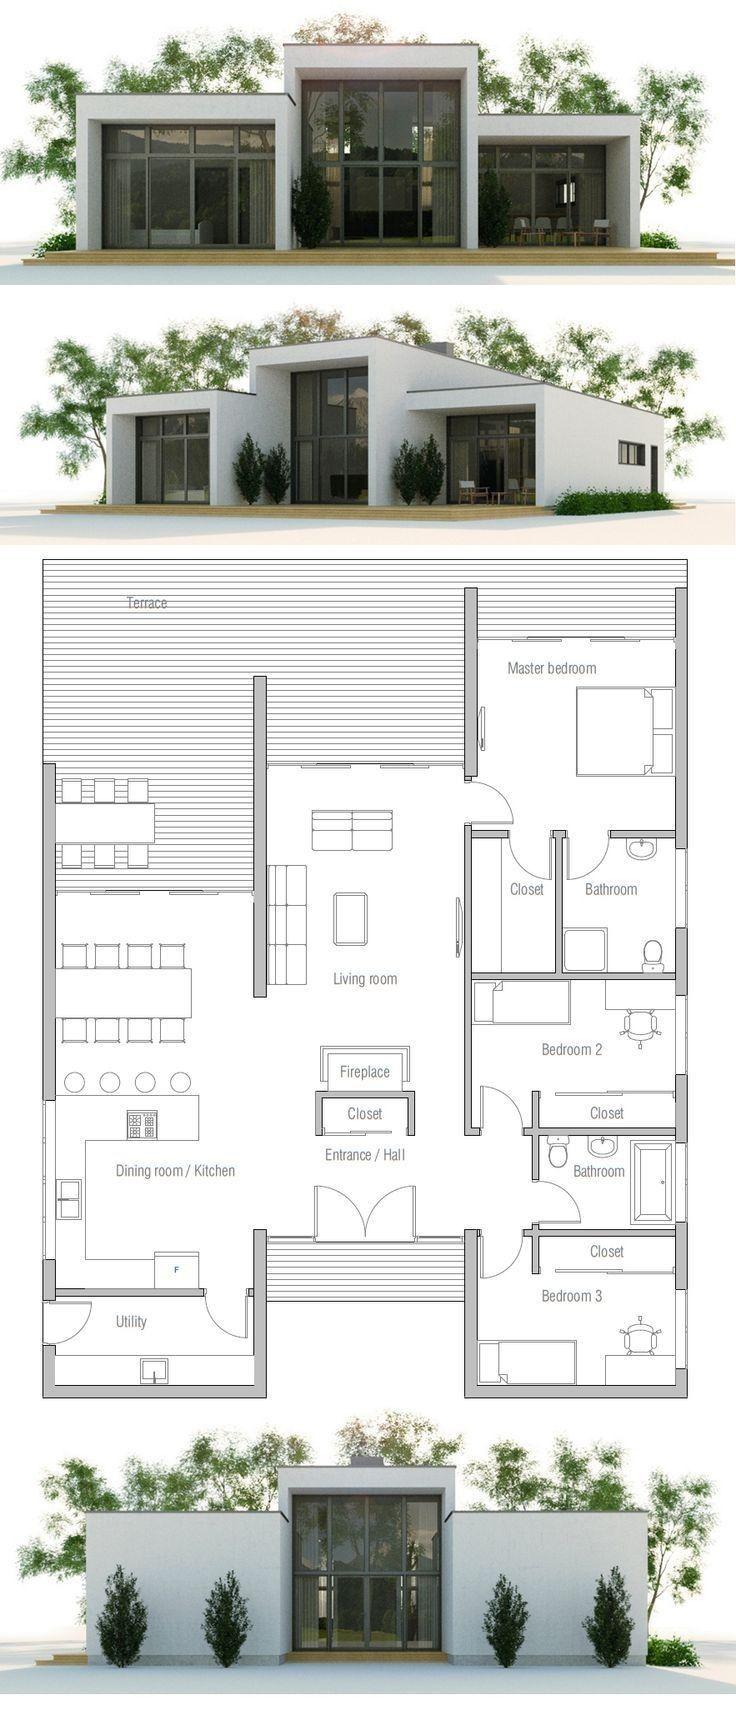 خطط منزلية مجانية Modern Minimalist House Container House Plans Minimalist House Design